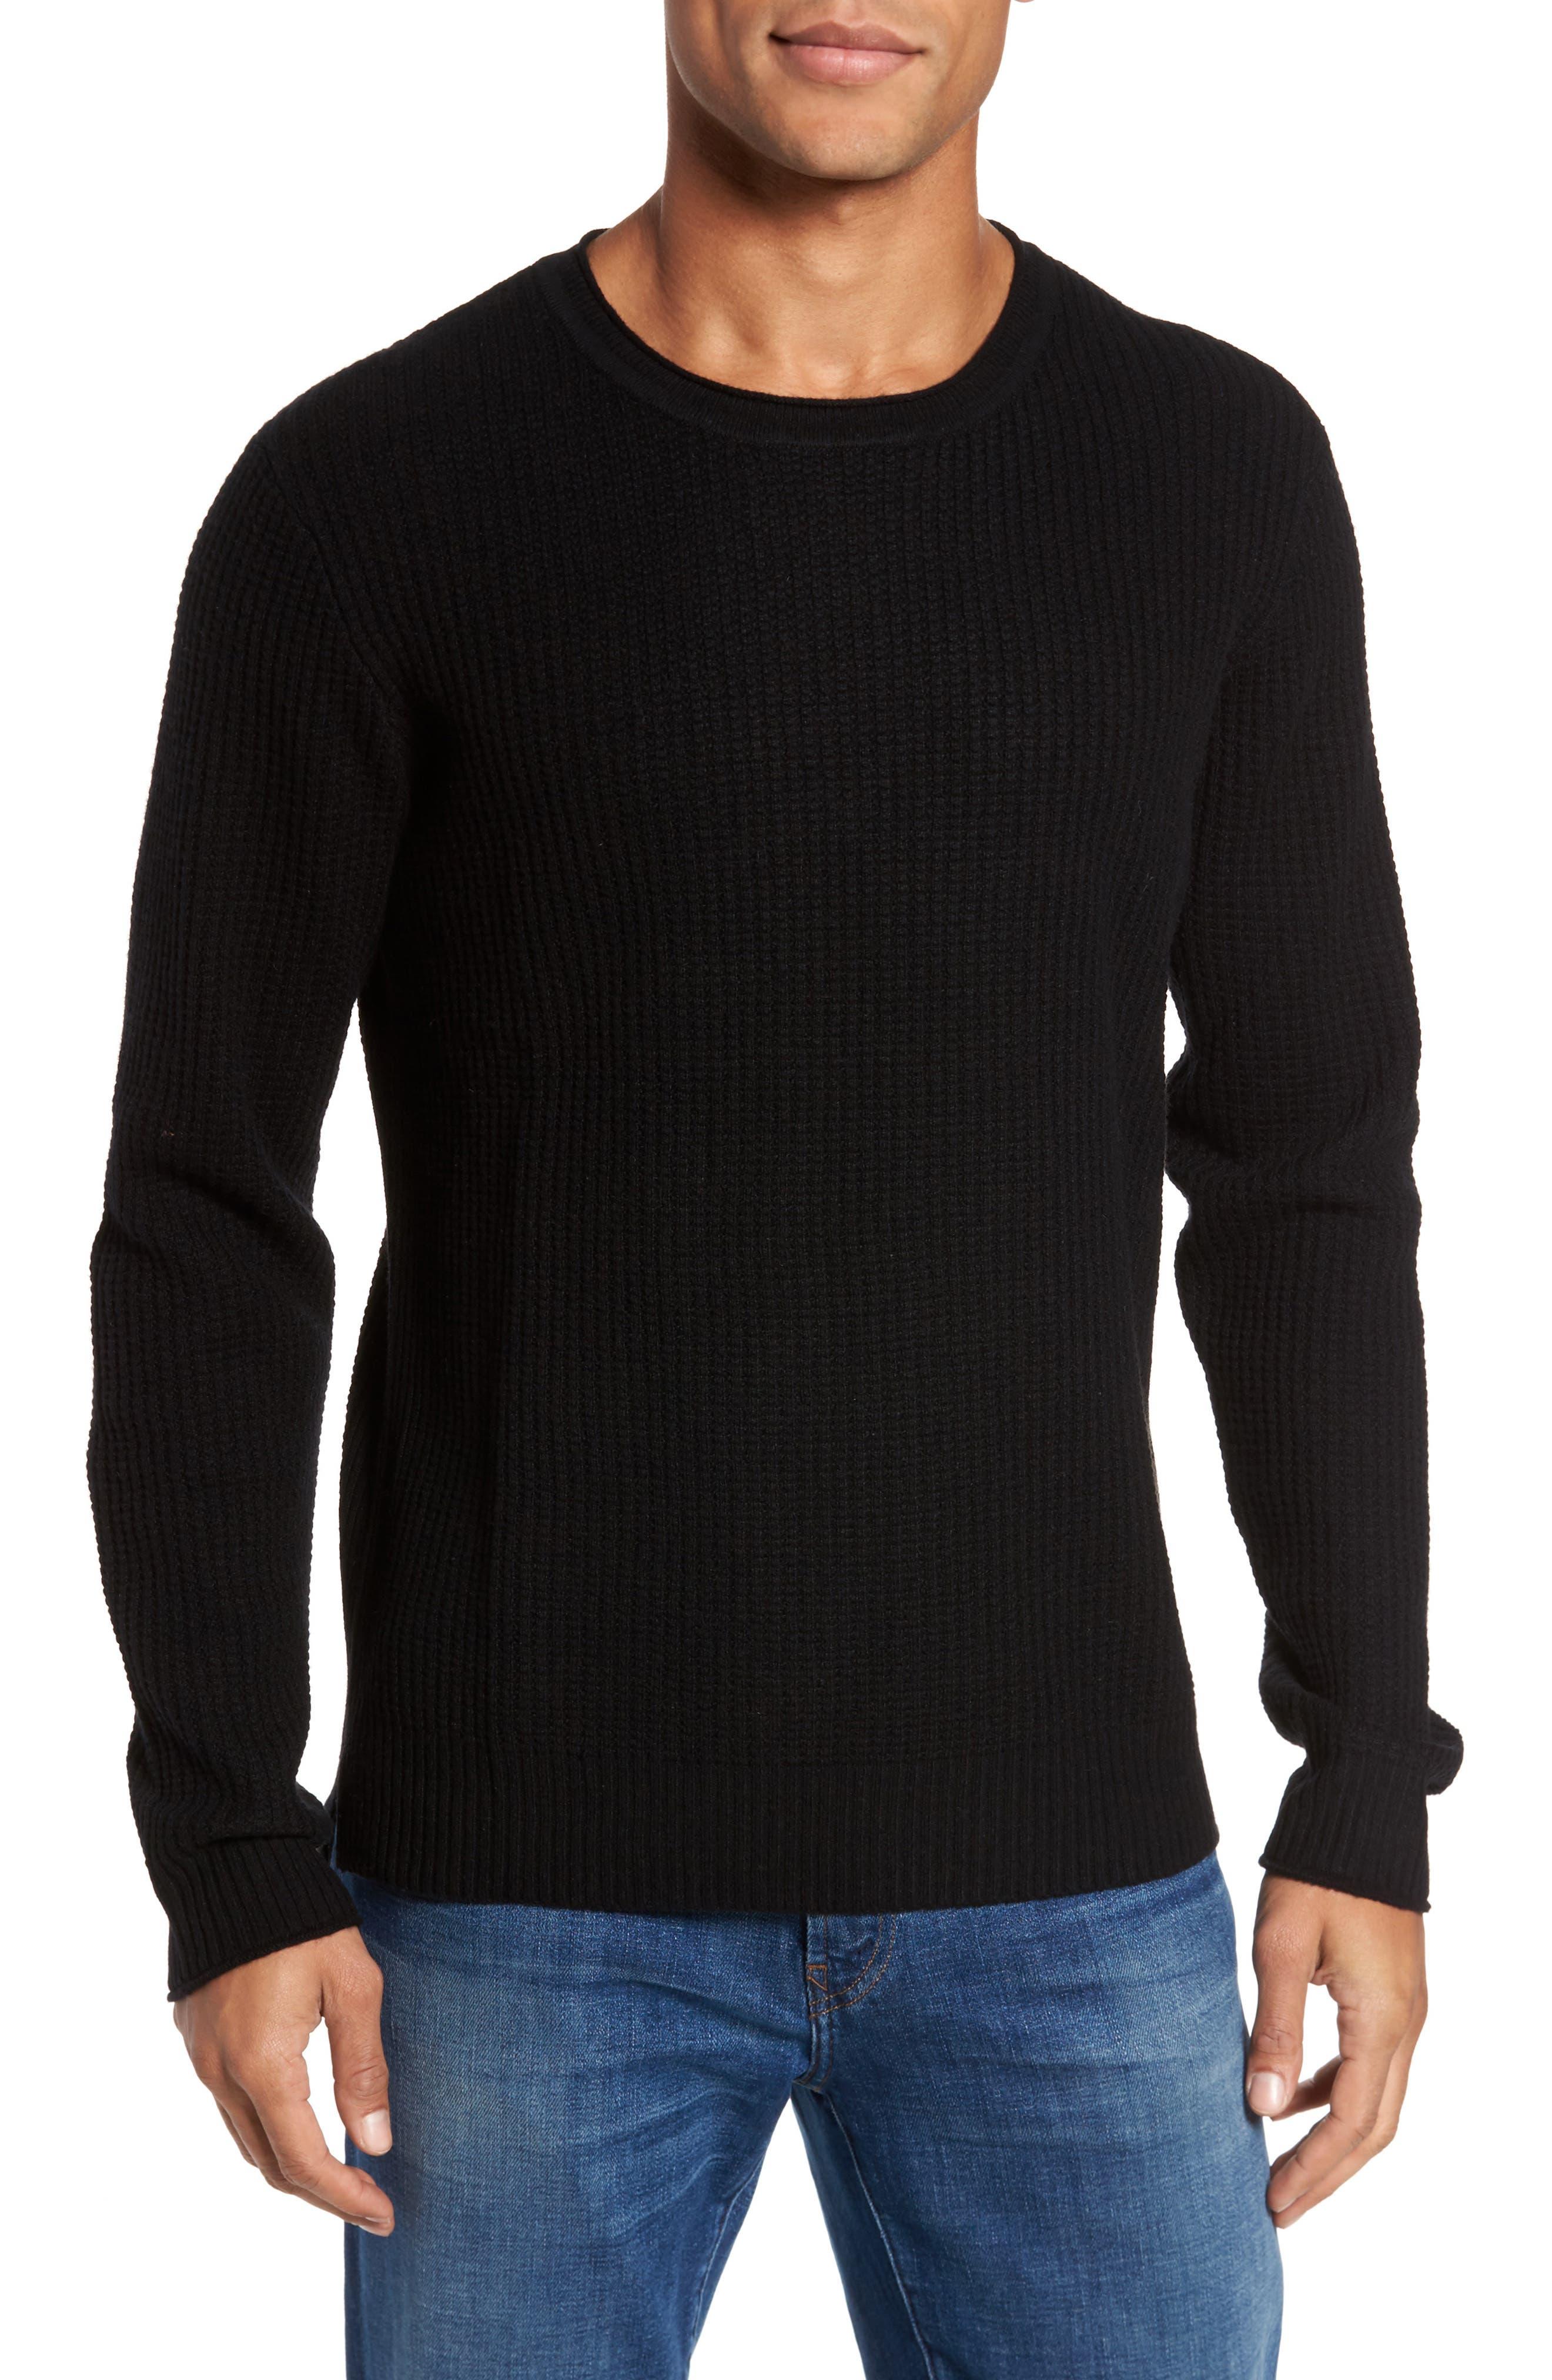 Deklyn Slim Fit Merino & Cashmere Sweatshirt,                             Main thumbnail 1, color,                             001